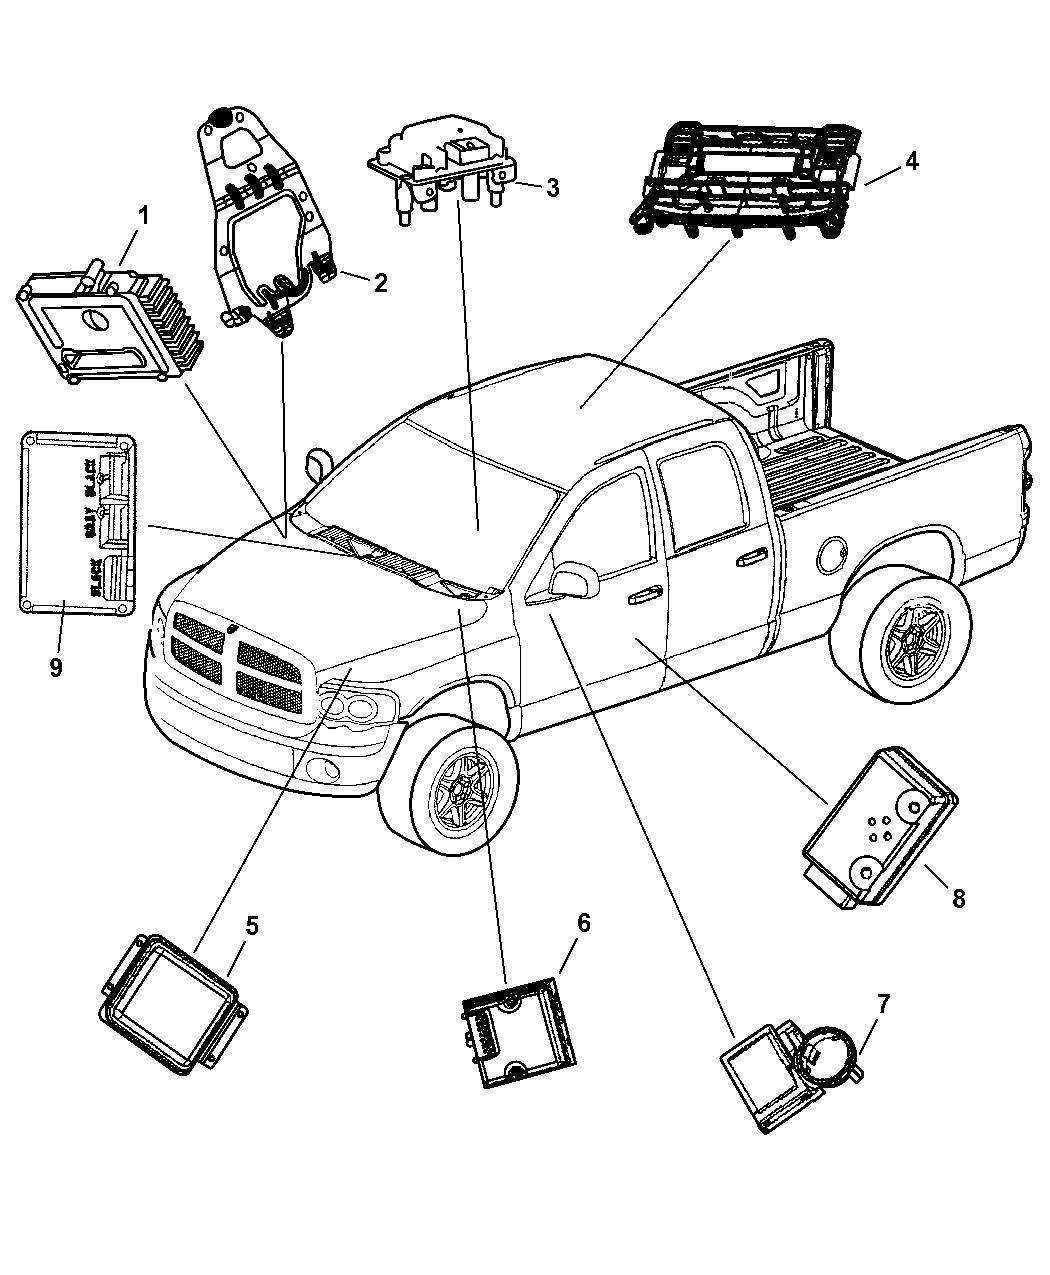 2002 Dodge Ram 1500 Modules